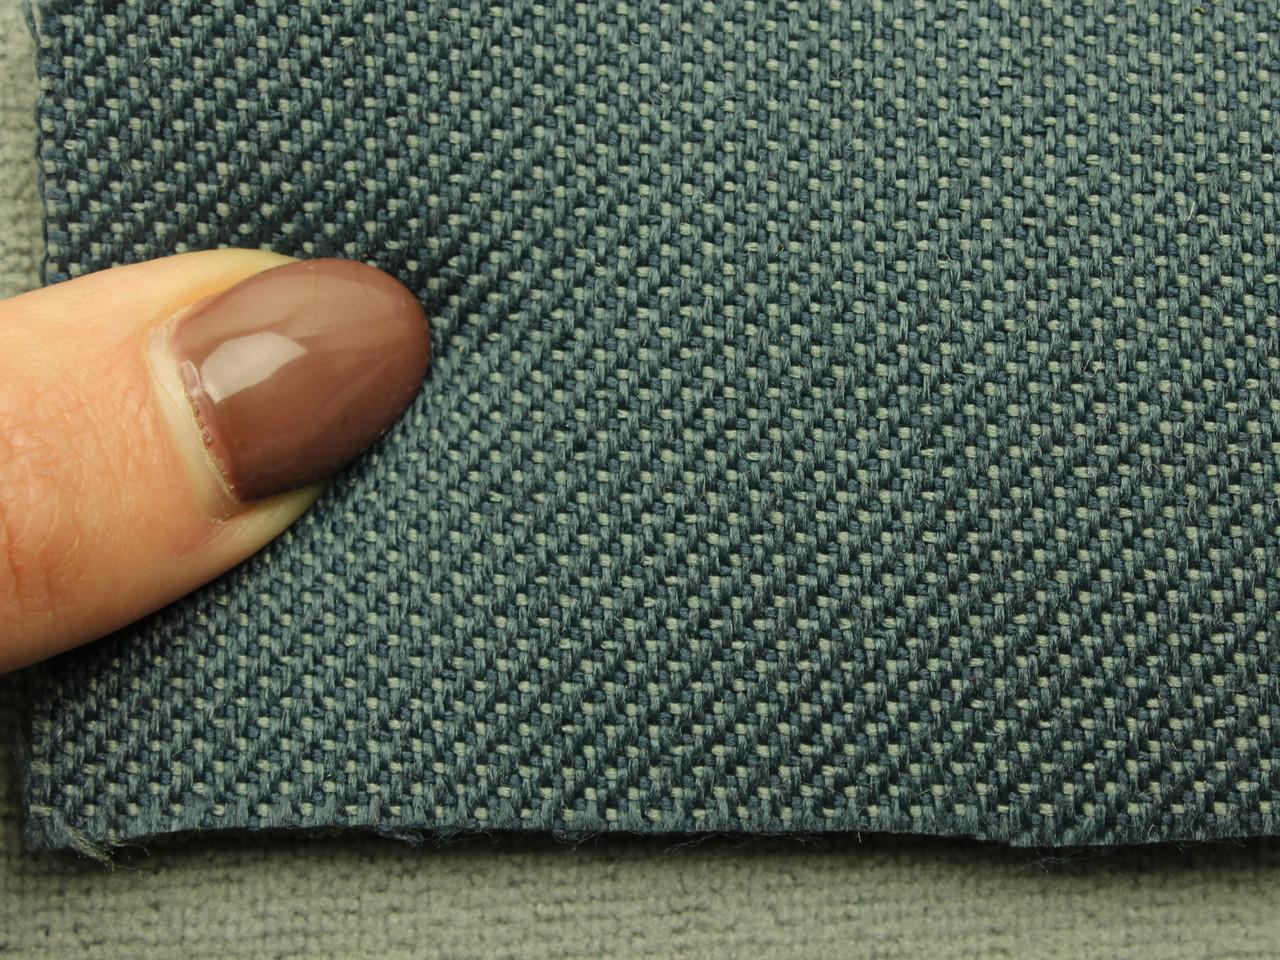 Ткань для сидений автомобиля, цвет темно-синий, на поролоне (для боковой части) Германия